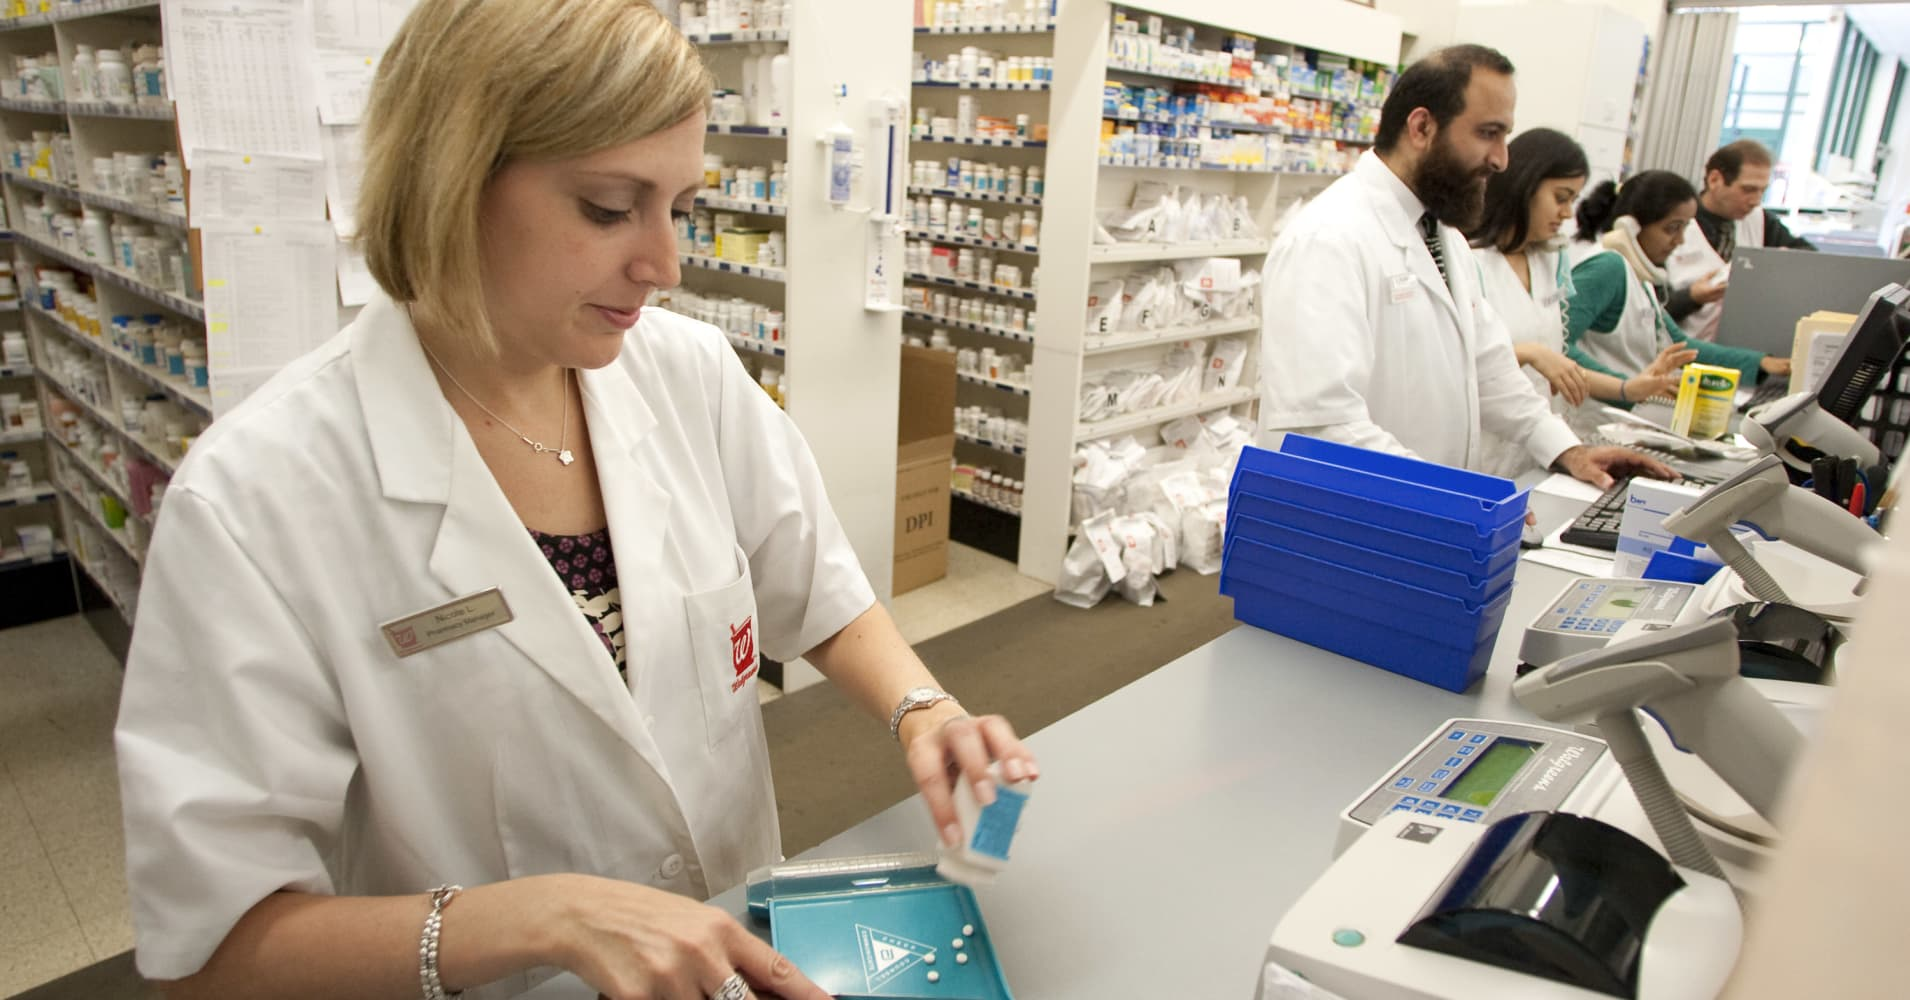 Pharmacy Technician Externship Resume Examples